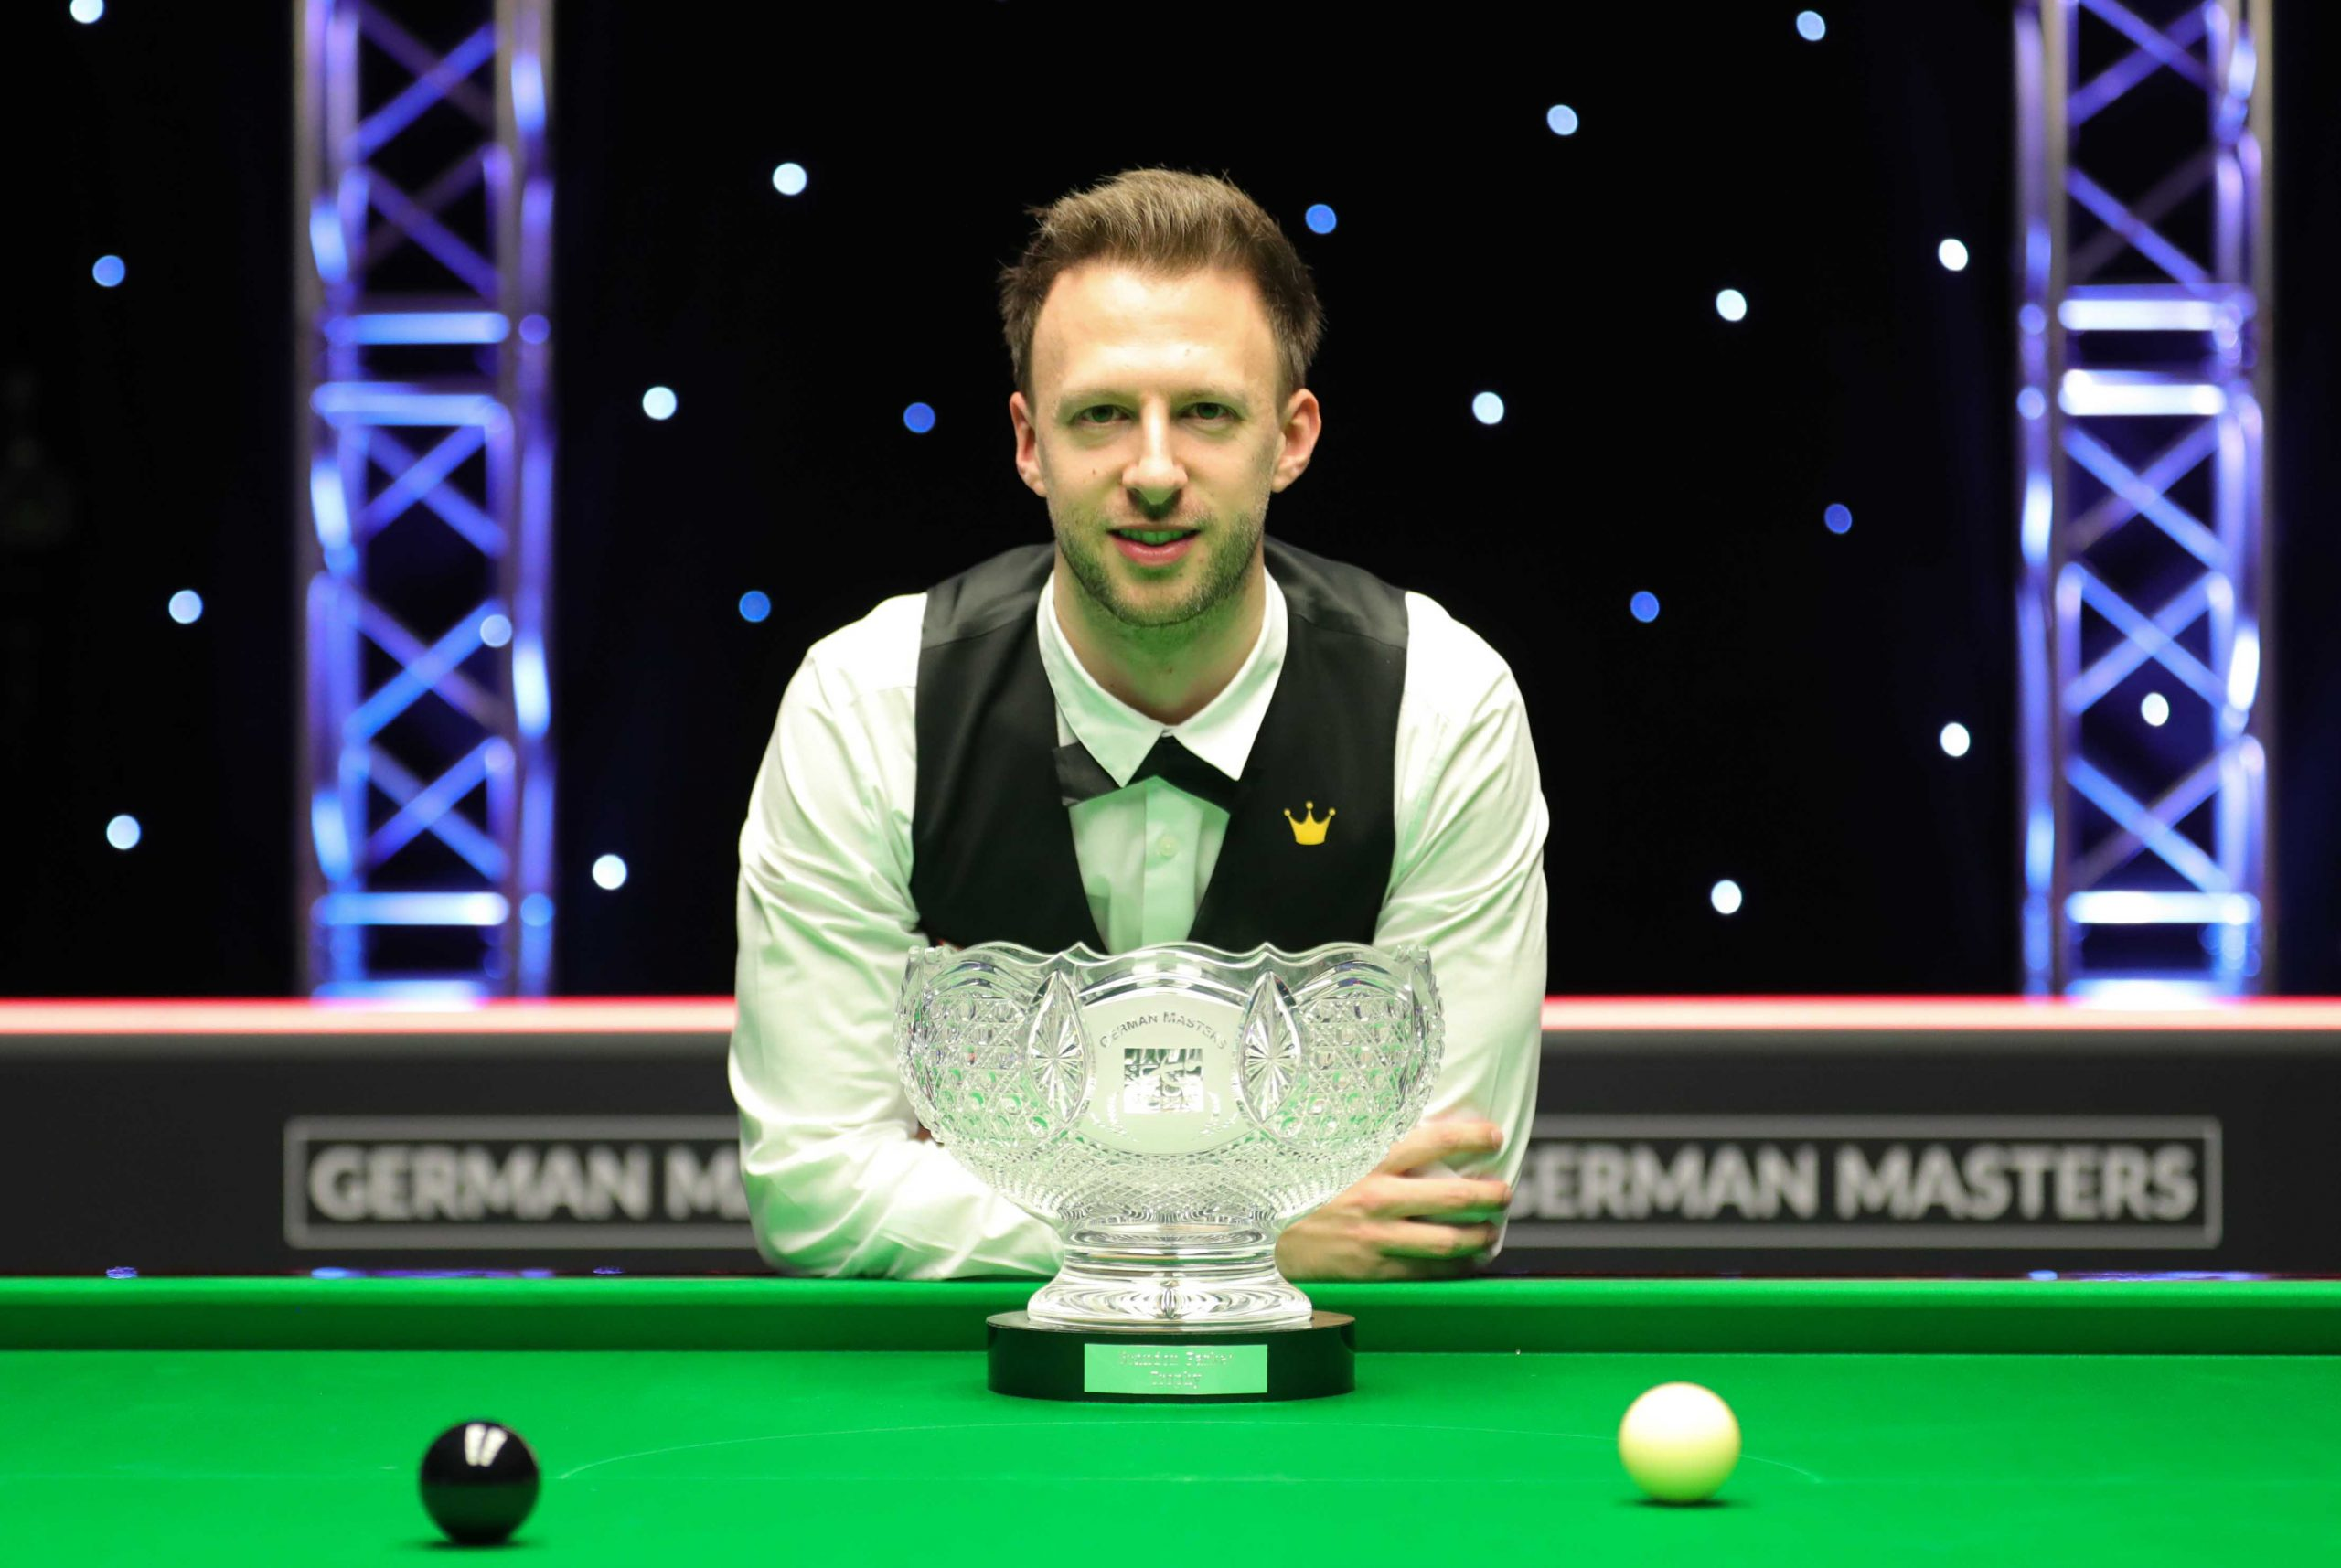 Judd Trump Wins The 2021 German Masters Ronnie O Sullivan